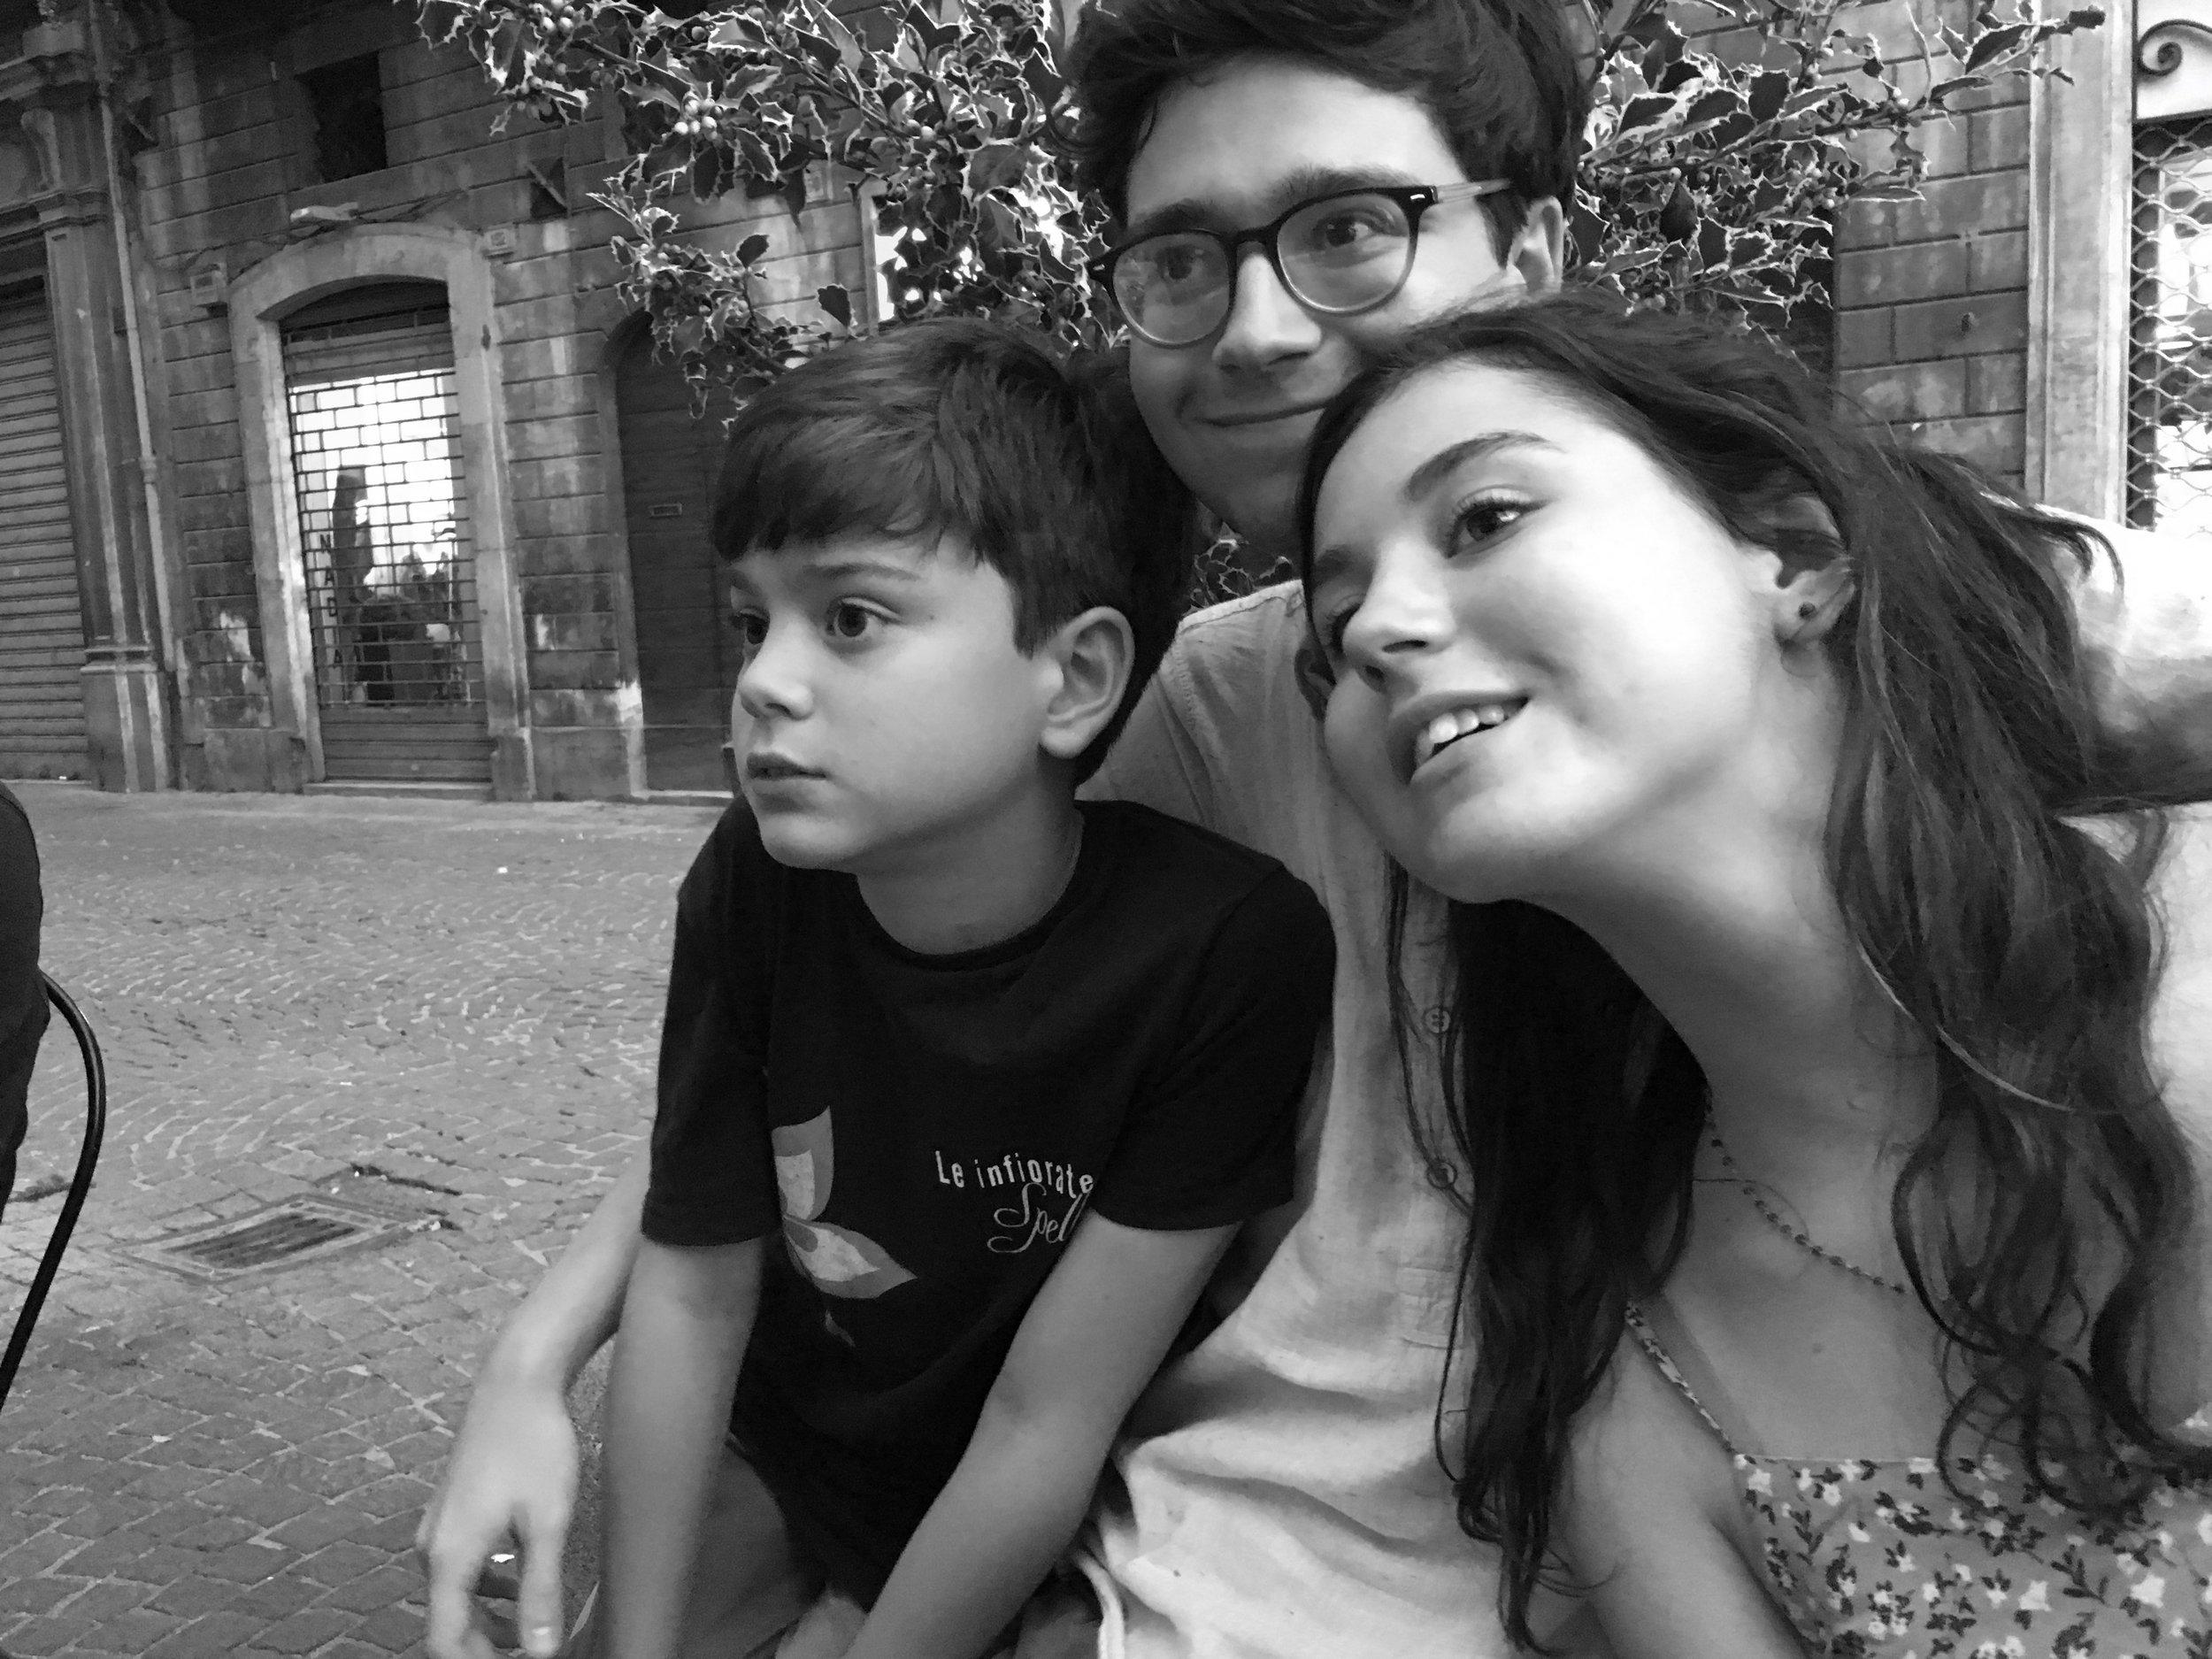 sulmona-kids-watch-game-bandw.jpg